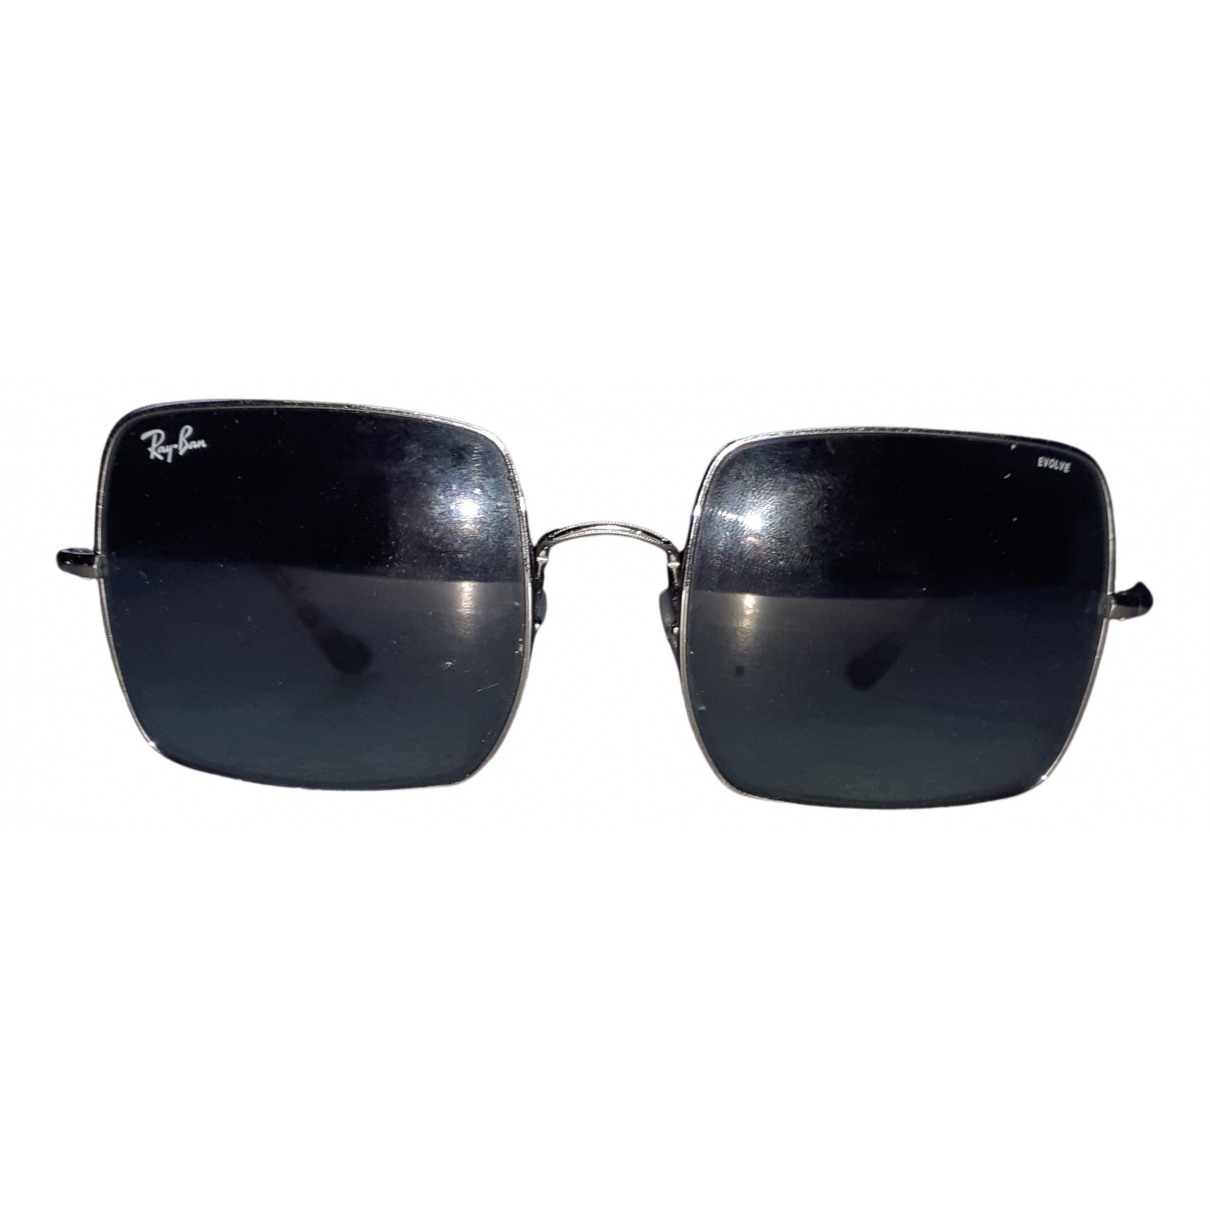 Ray-ban N Silver Metal Sunglasses for Men N